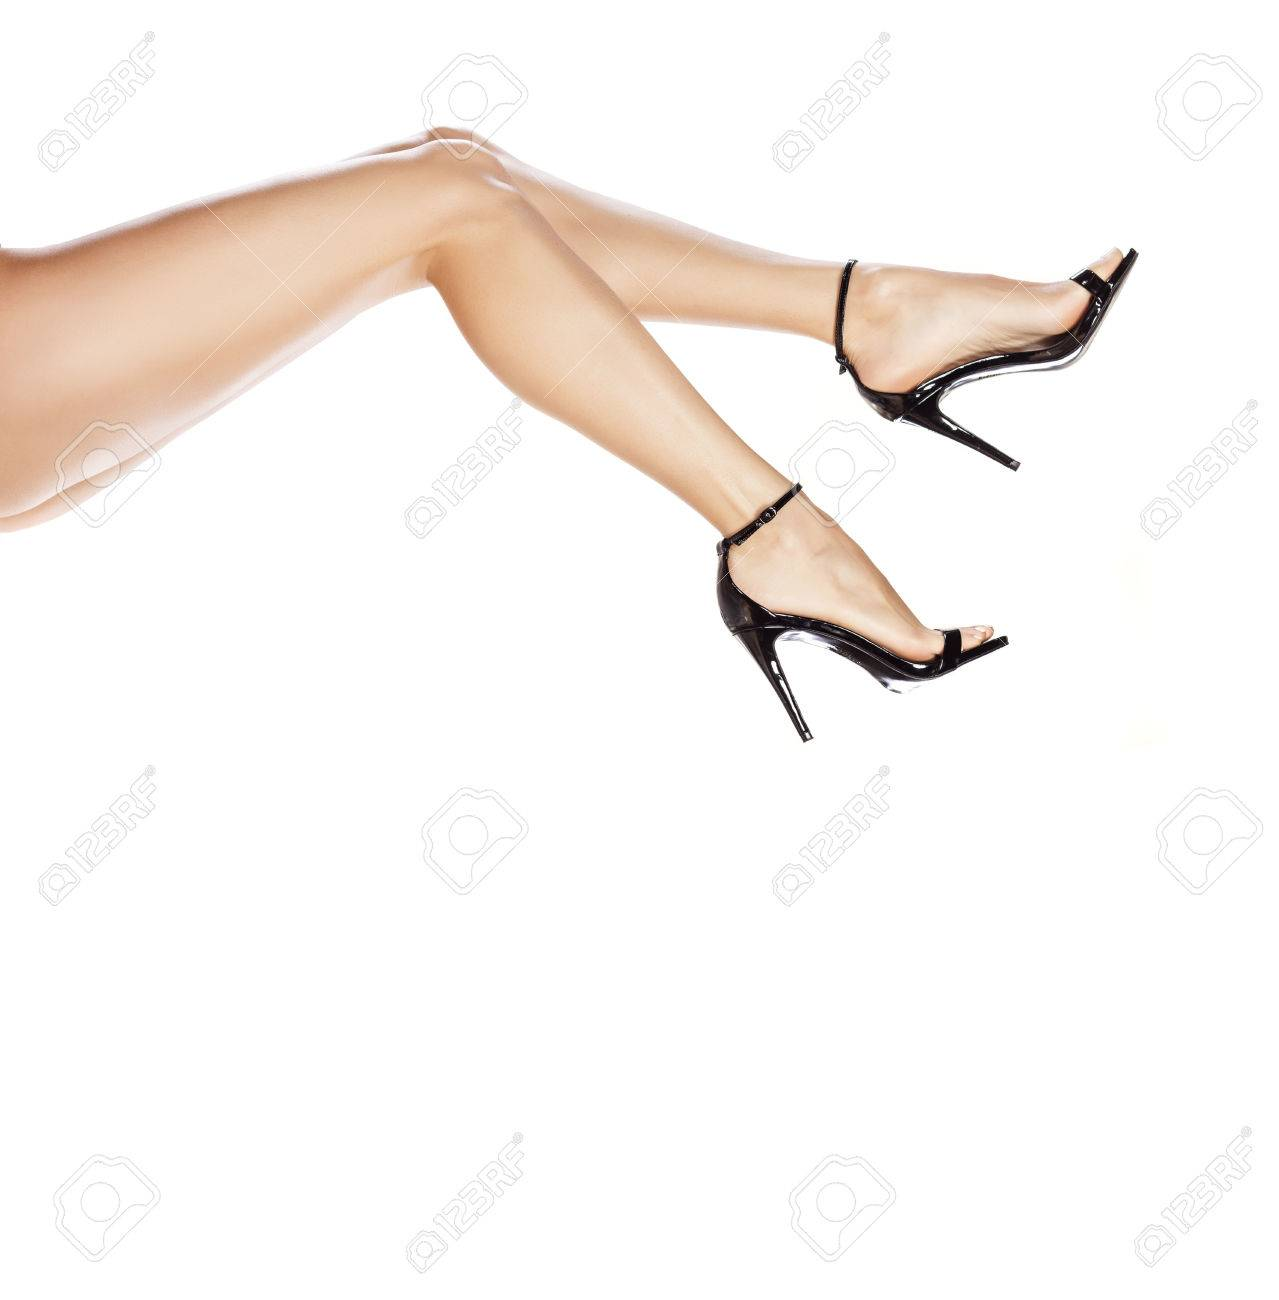 8ca4df765bfdb7 pretty female legs in elegant sandals with high heels Stock Photo - 70117983